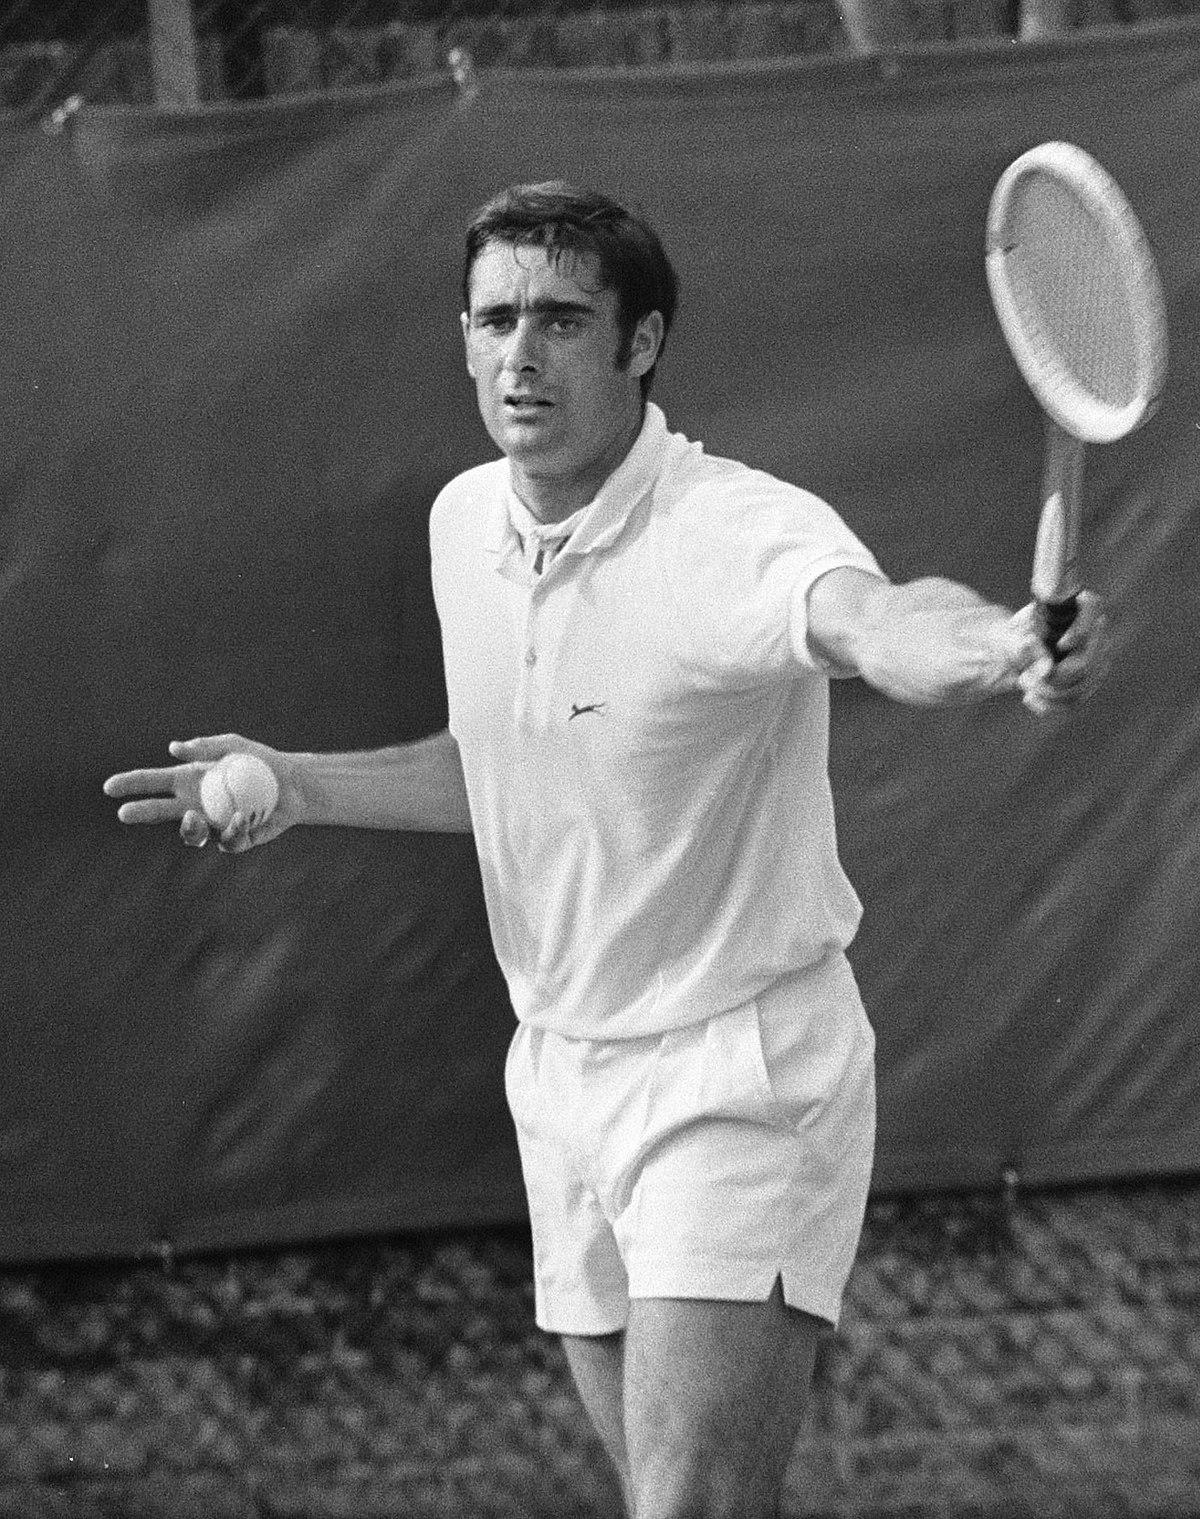 Roger Taylor (tennis) - Wikipedia